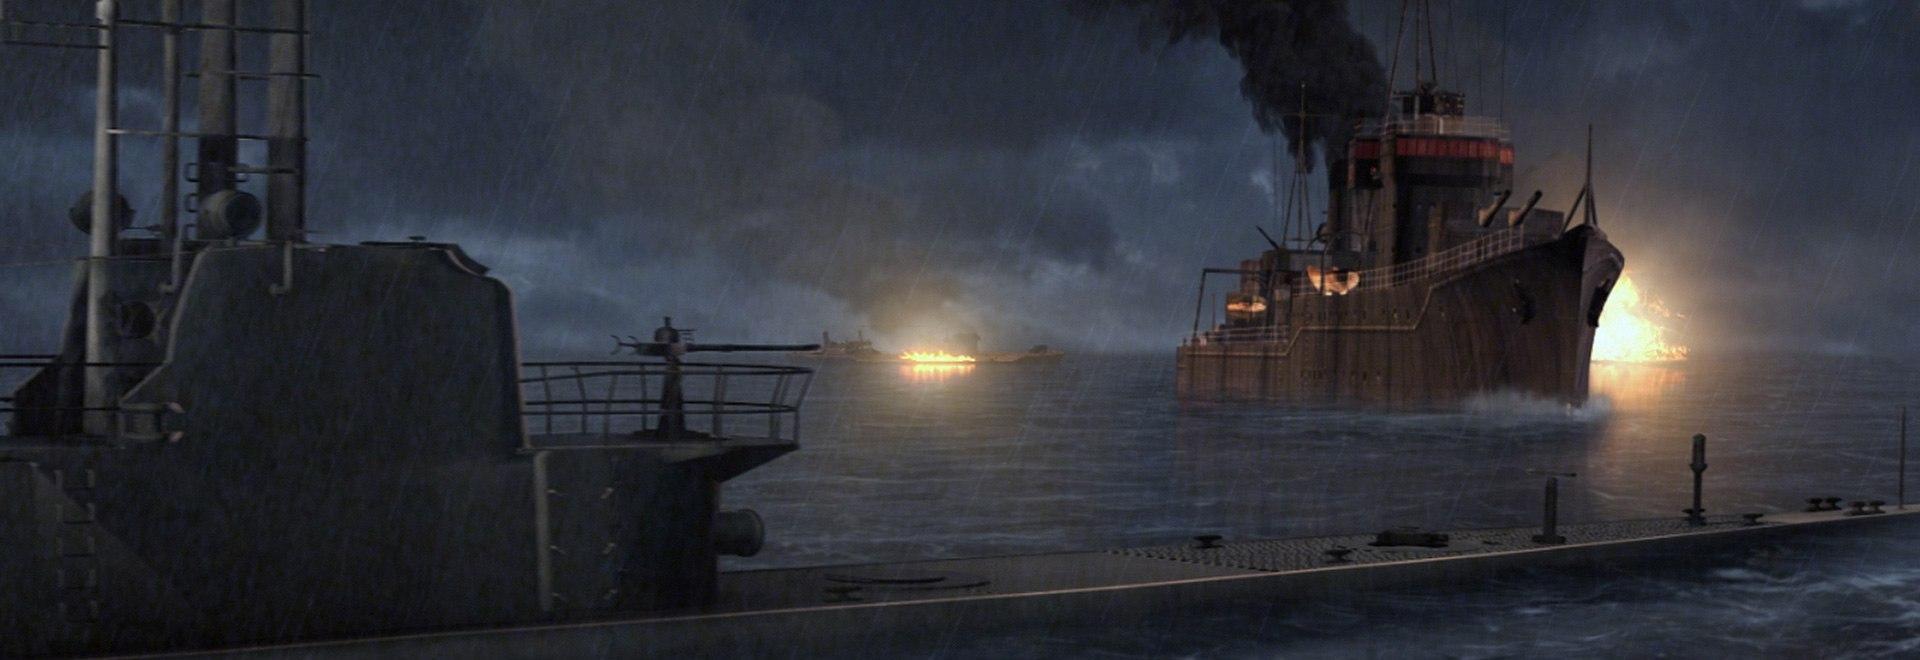 Missione Royal Navy